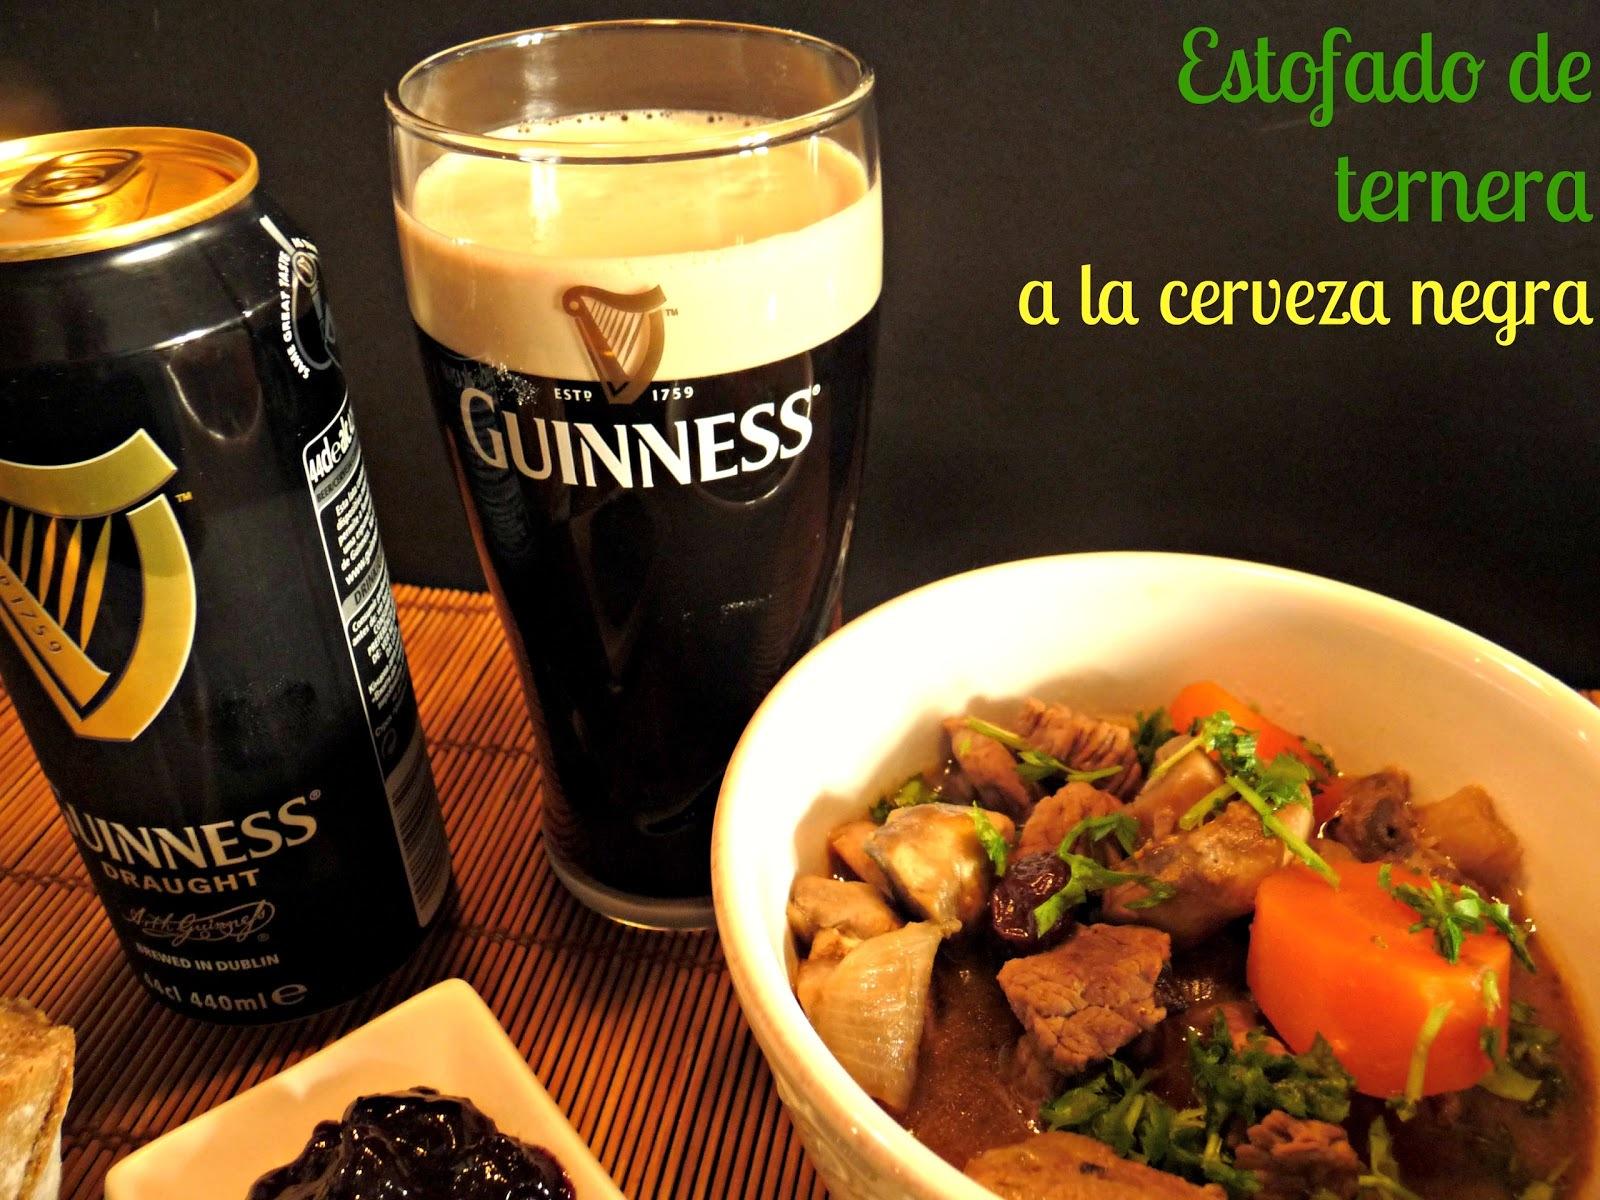 Estofado de ternera a la cerveza negra #SanPatricio